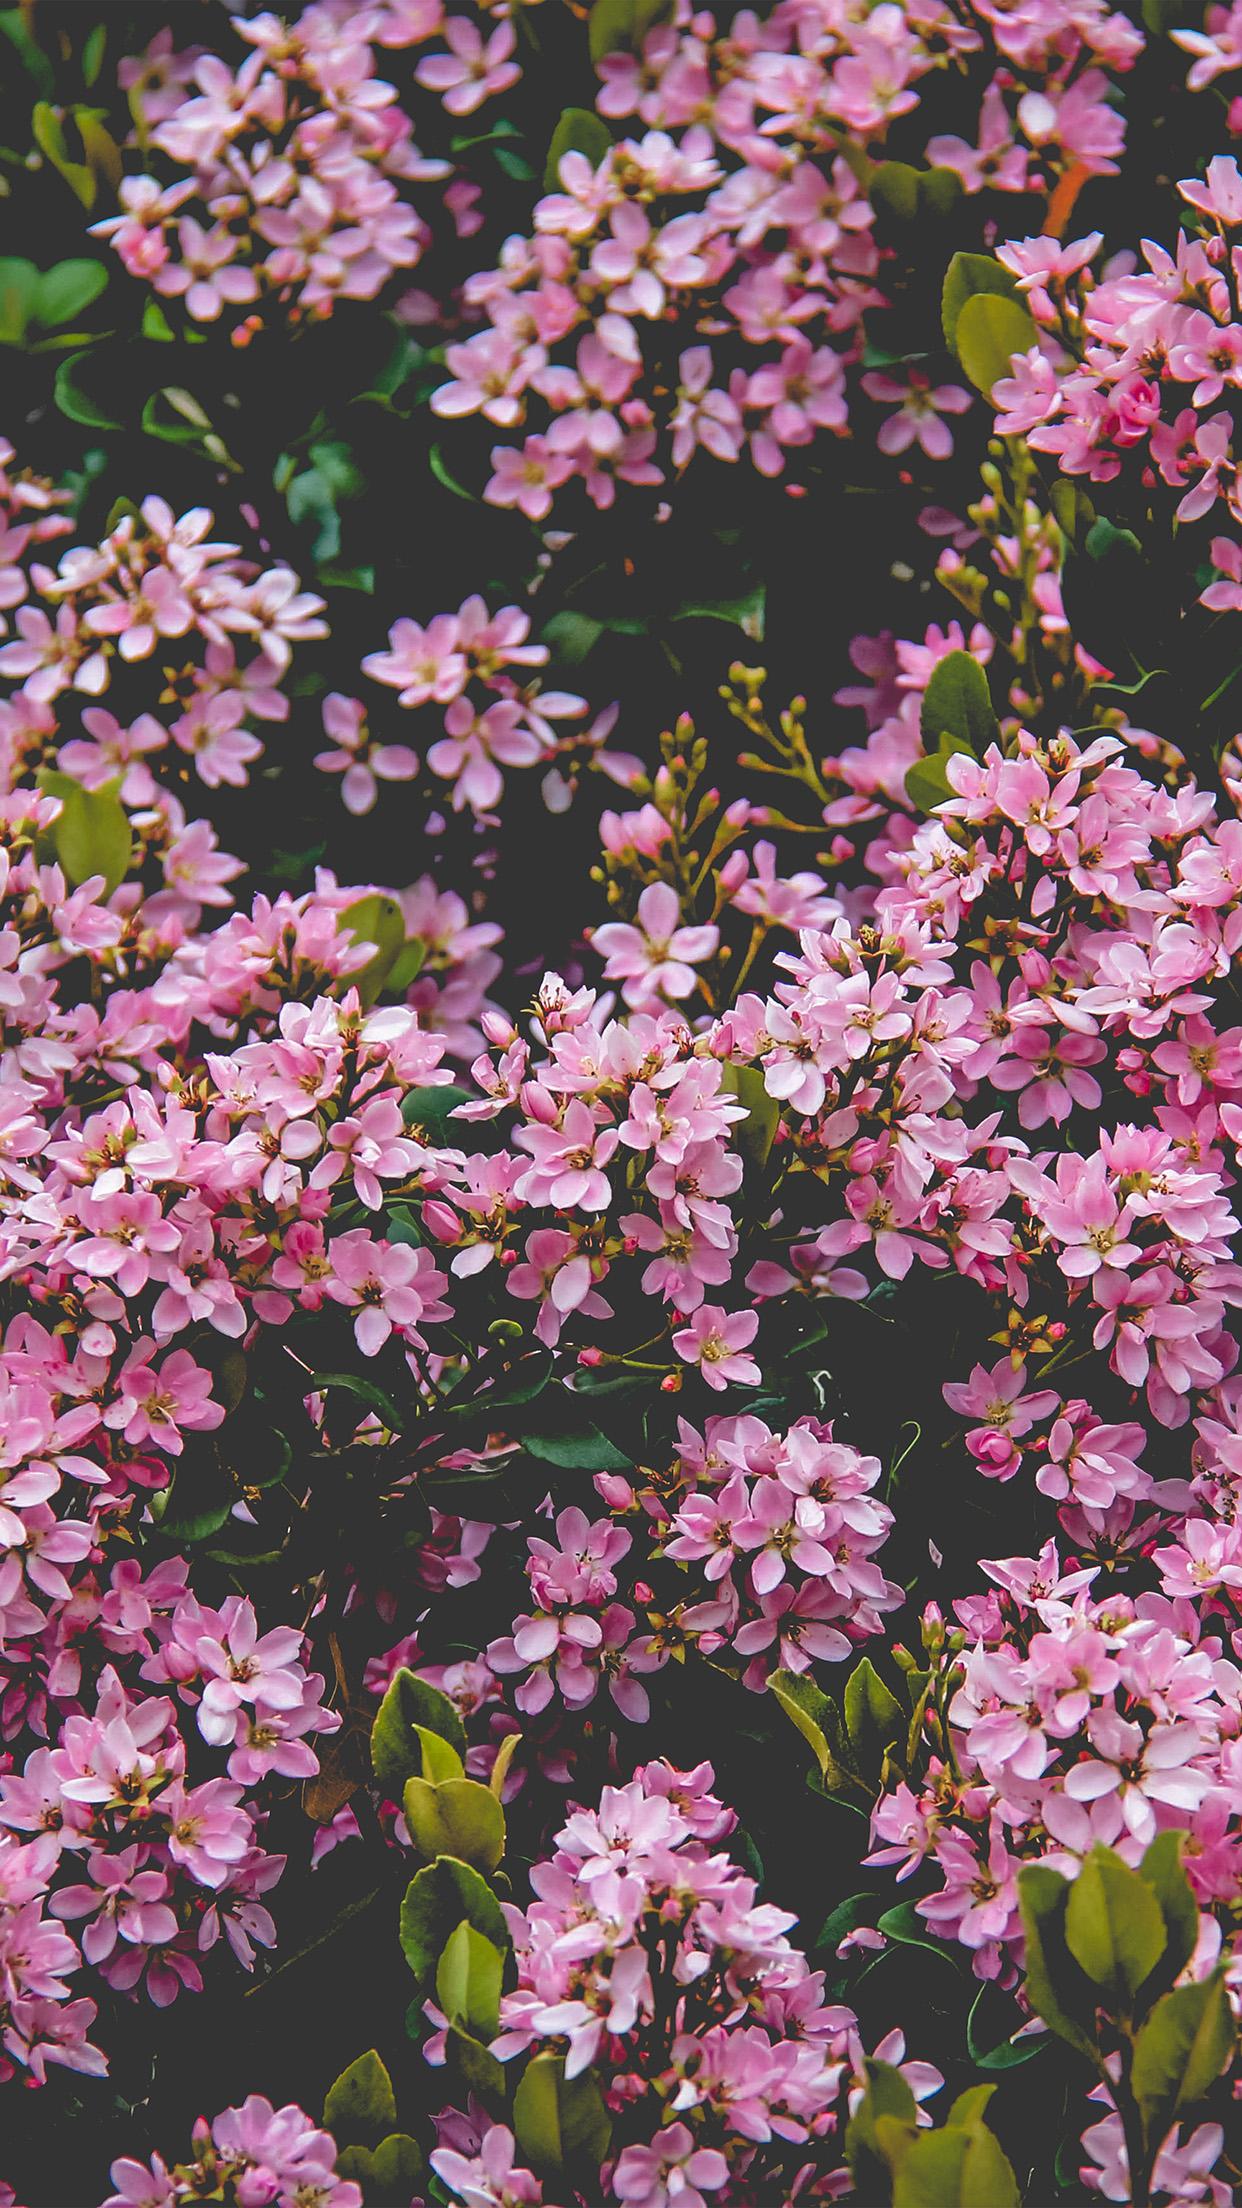 Disney Wallpaper Hd Nv68 Flower Pink Spring Happy Nature Wallpaper